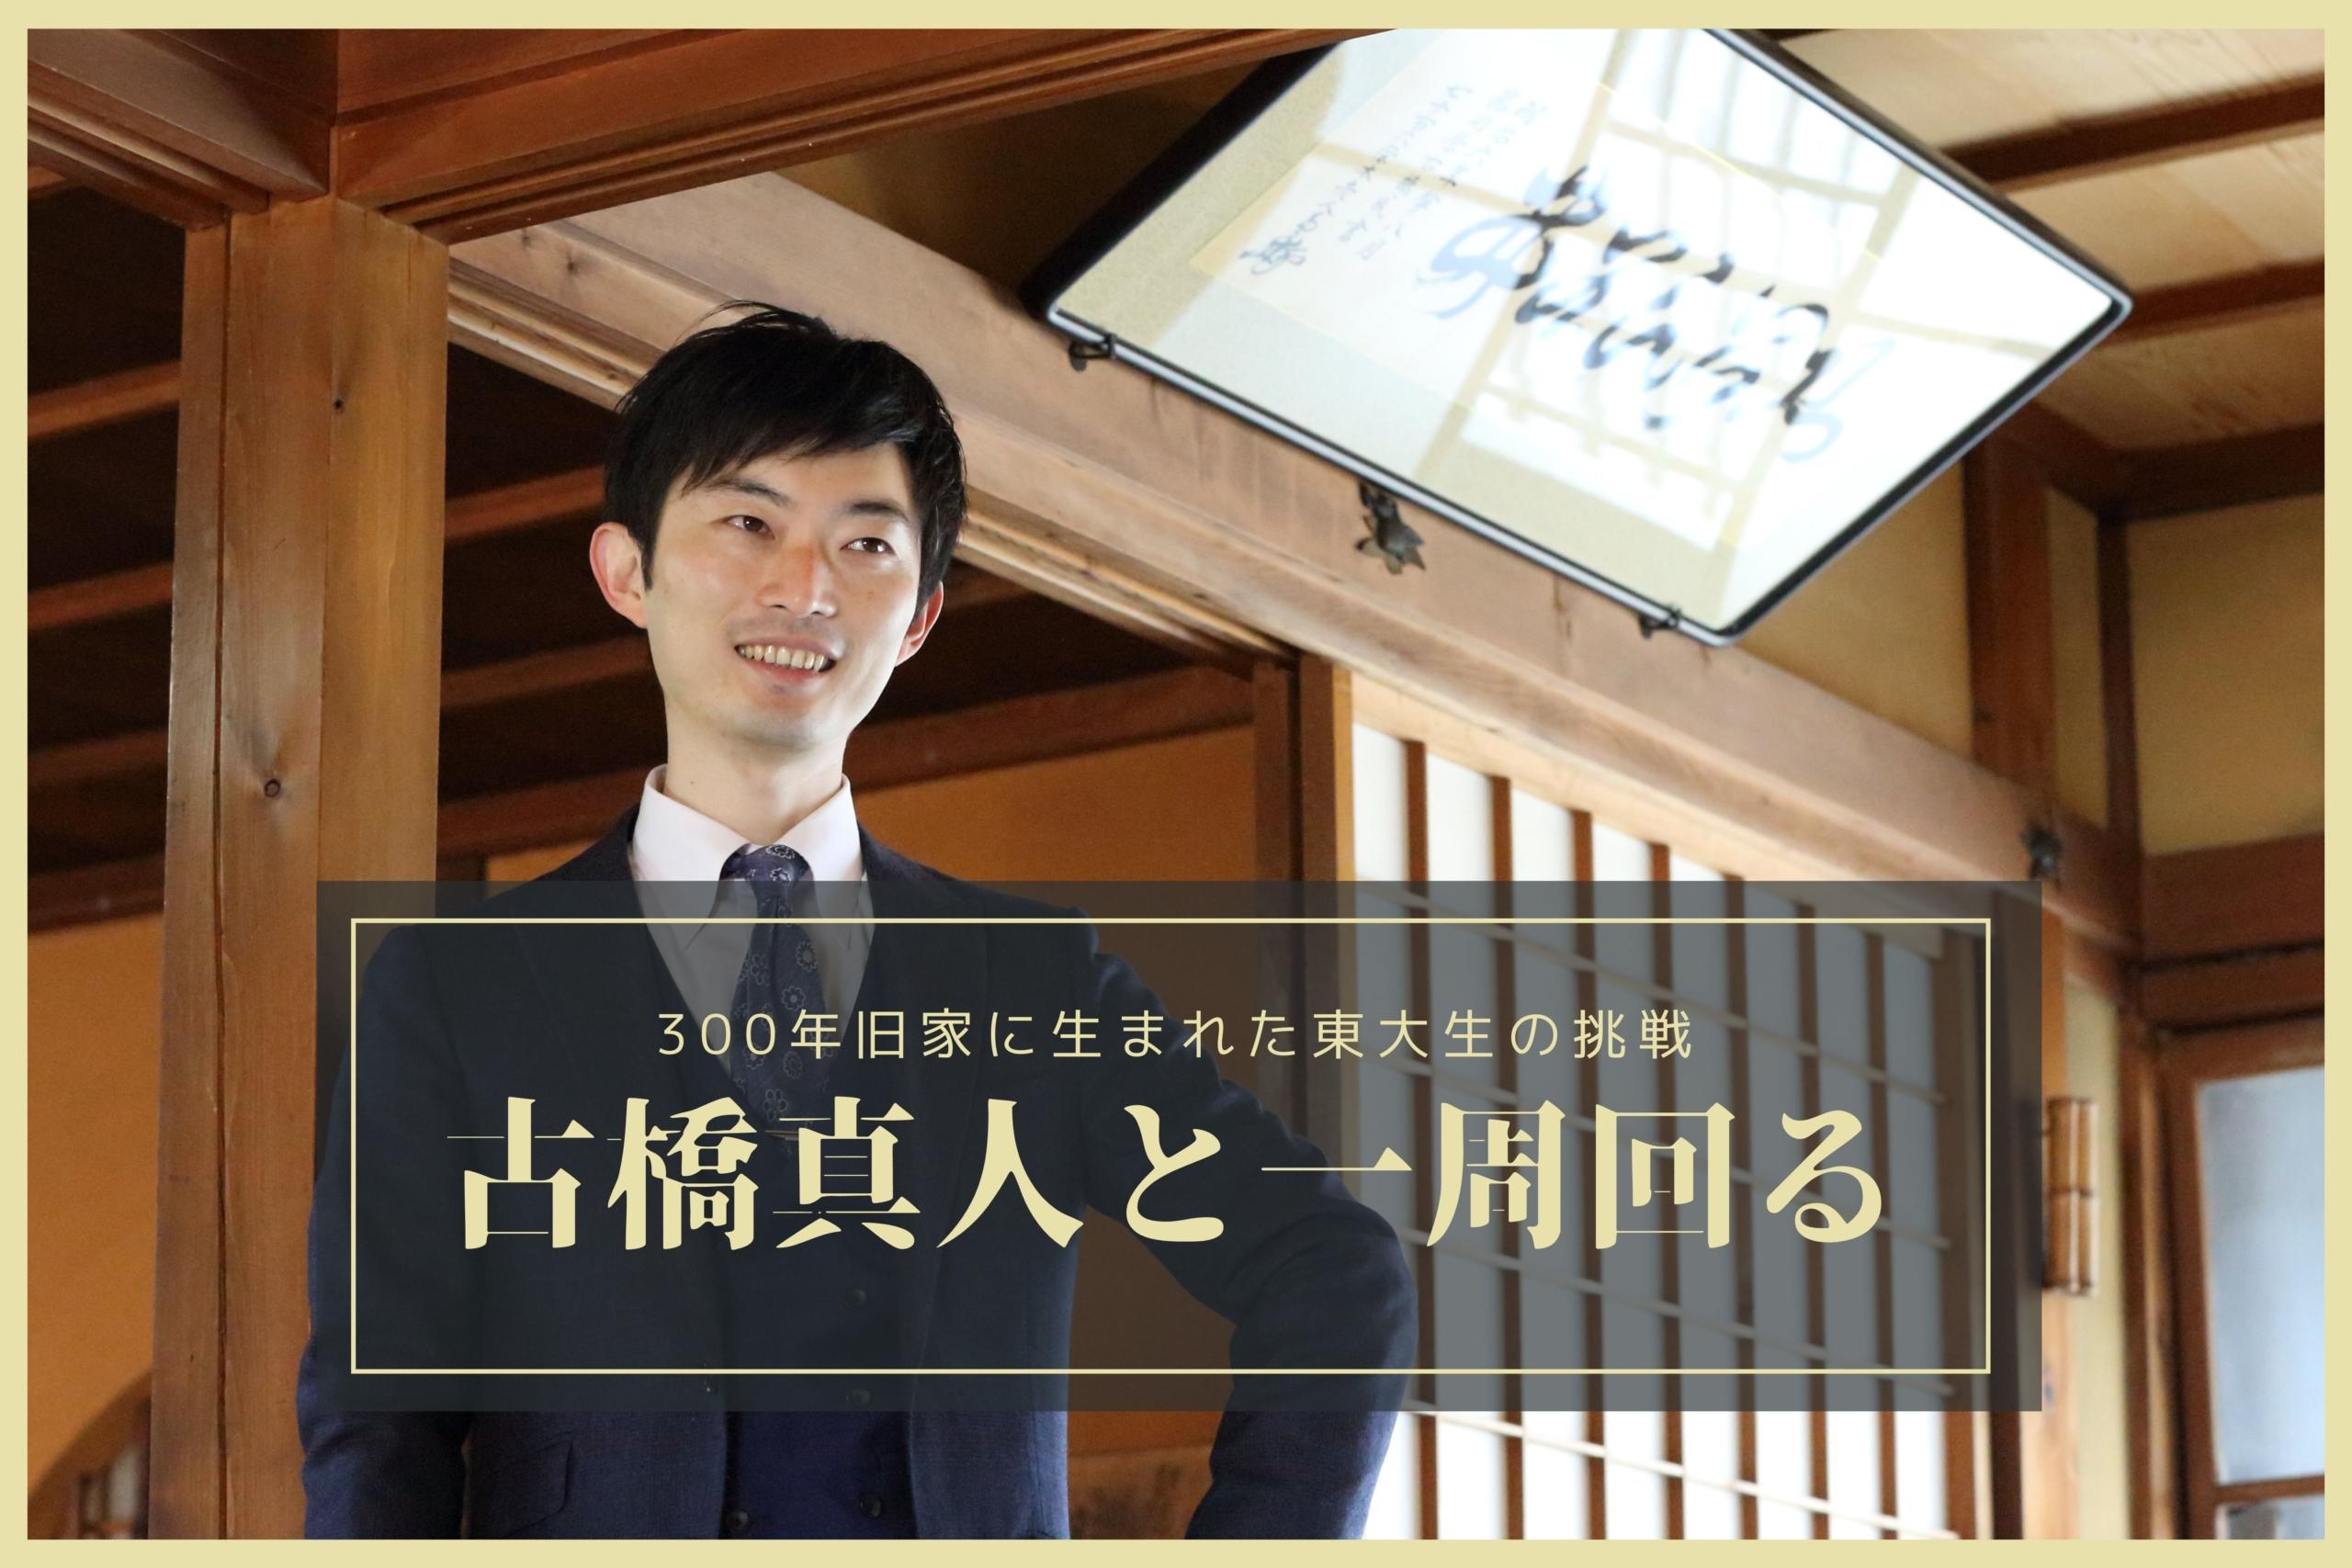 furuhashimasahito_ic2